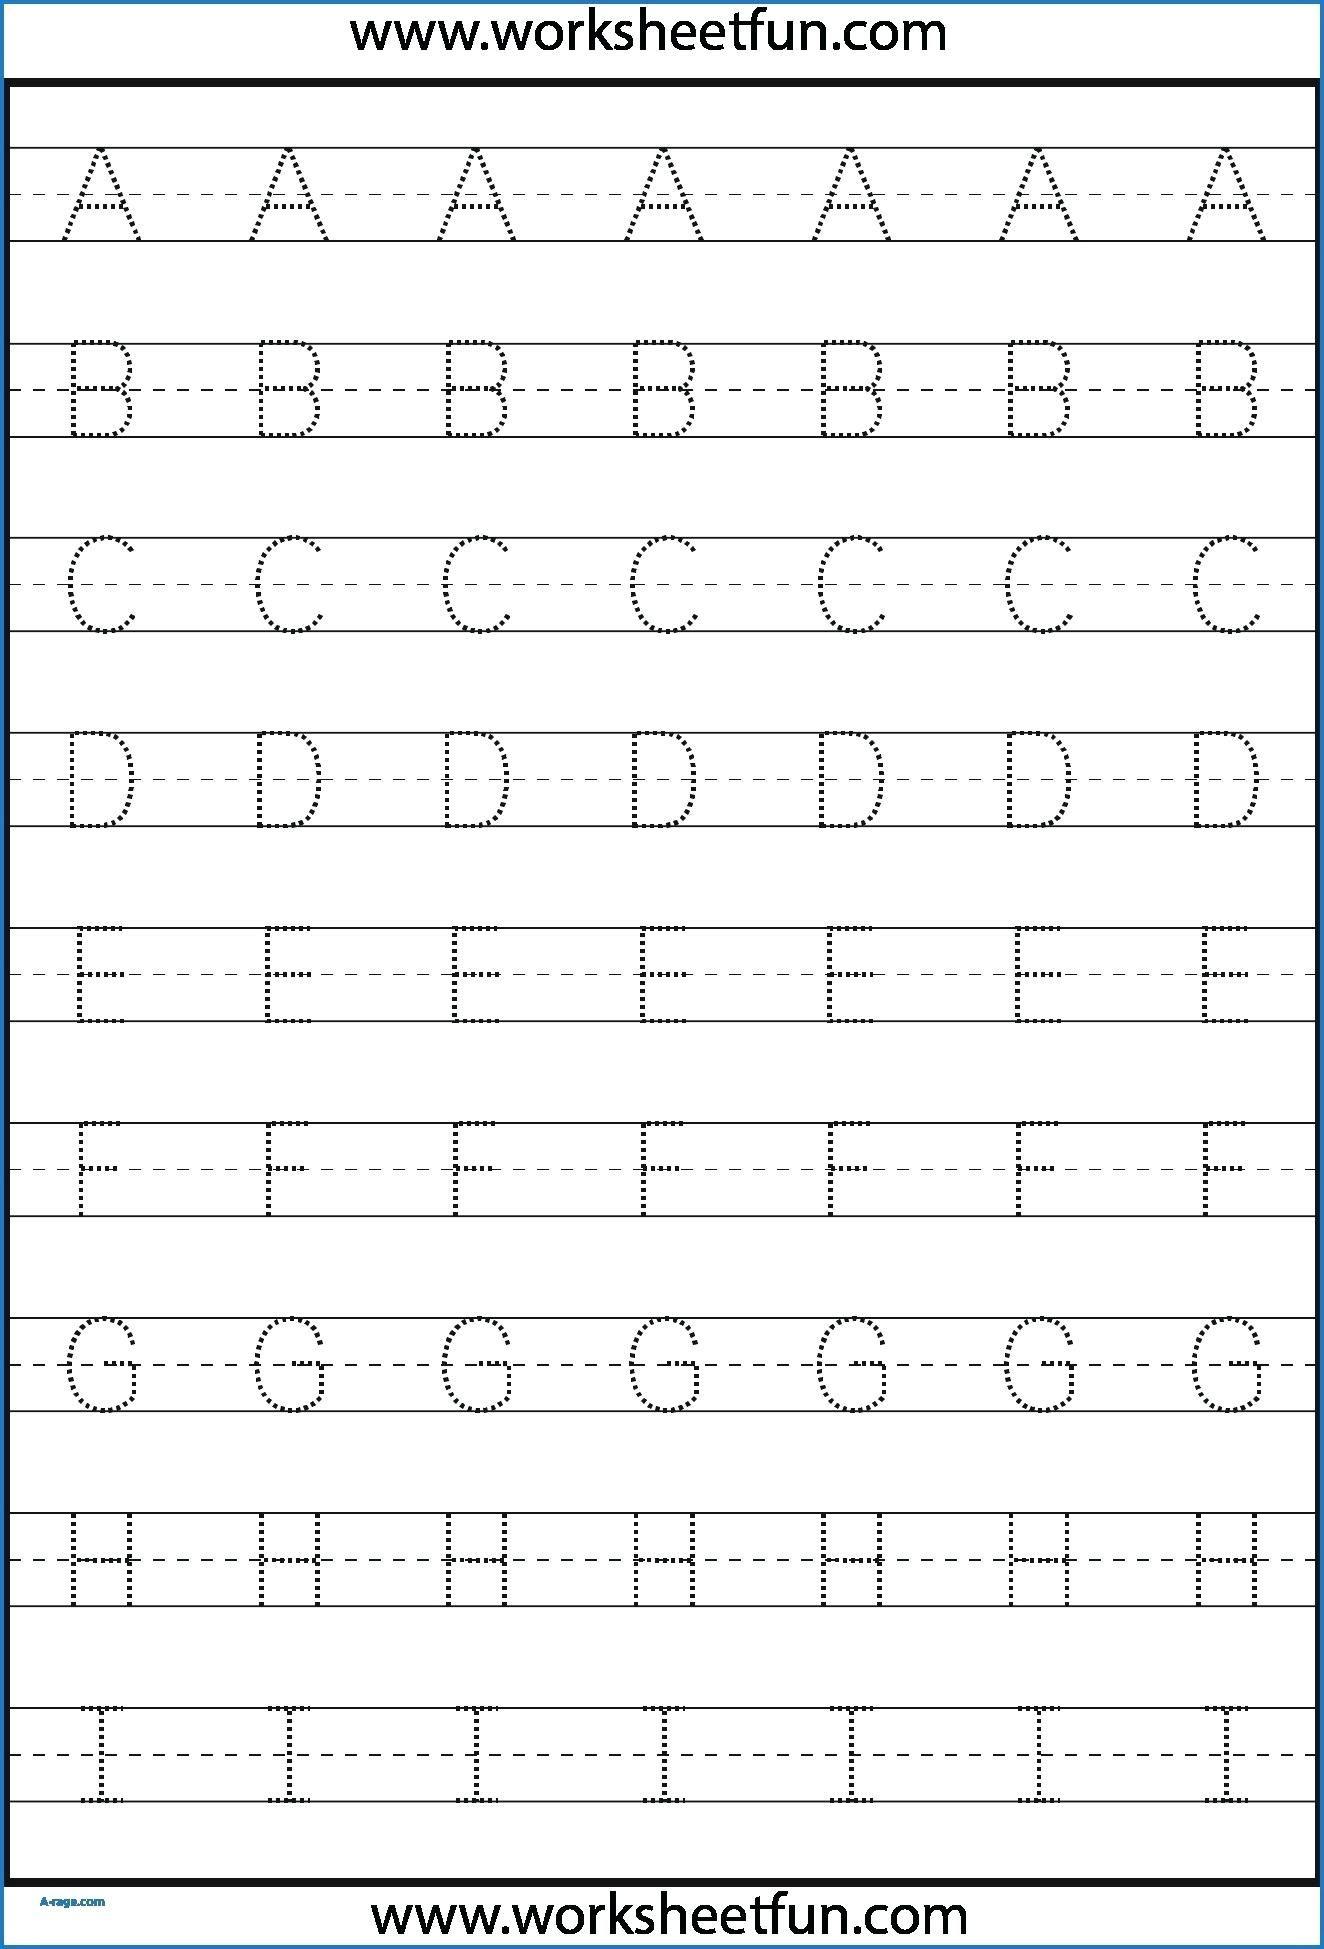 Kindergarten Letter Tracing Worksheets Pdf - Wallpaper Image pertaining to Tracing Worksheets For Kindergarten On Letters